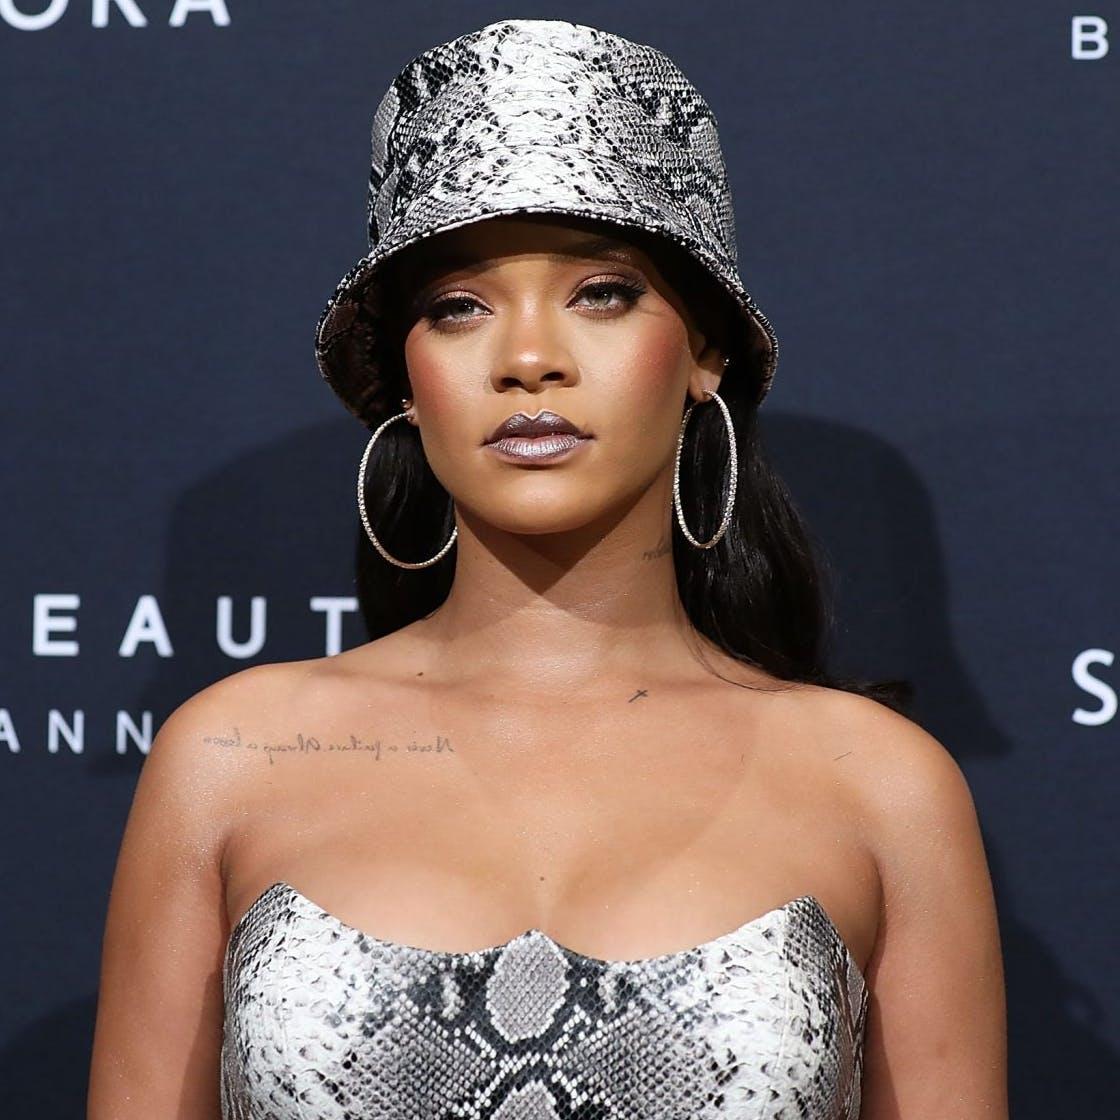 Beauty 2 Fashion: Rihanna And LVMH To Launch Luxury Fashion Brand, According